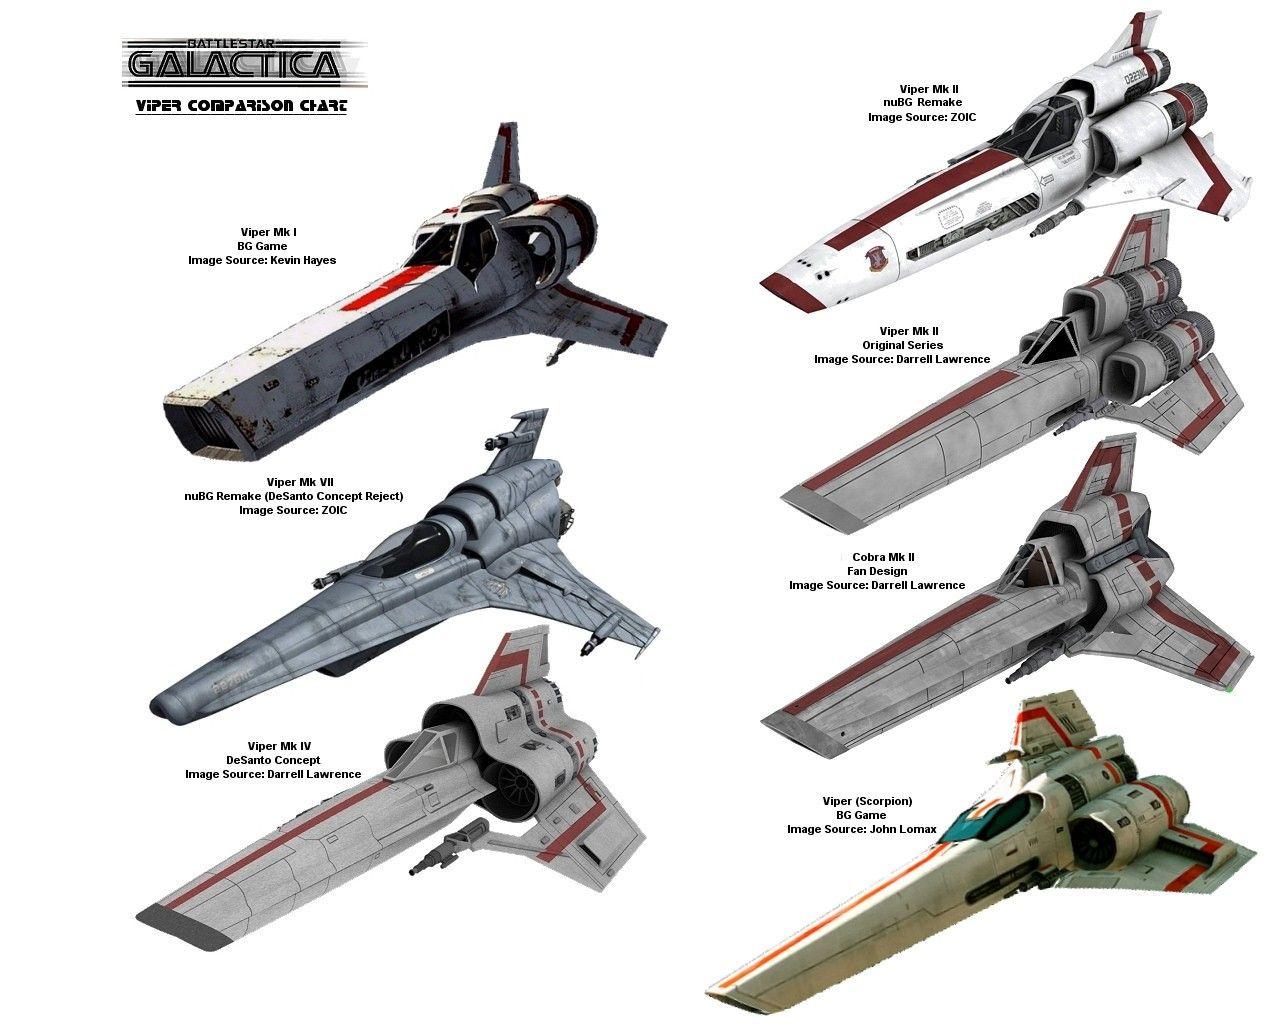 Battlestar Galactica Action Adventure Drama Sci Fi Spaceship Wallpaper Battlestar Galactica Battlestar Galactica Wallpaper Viper Wallpaper